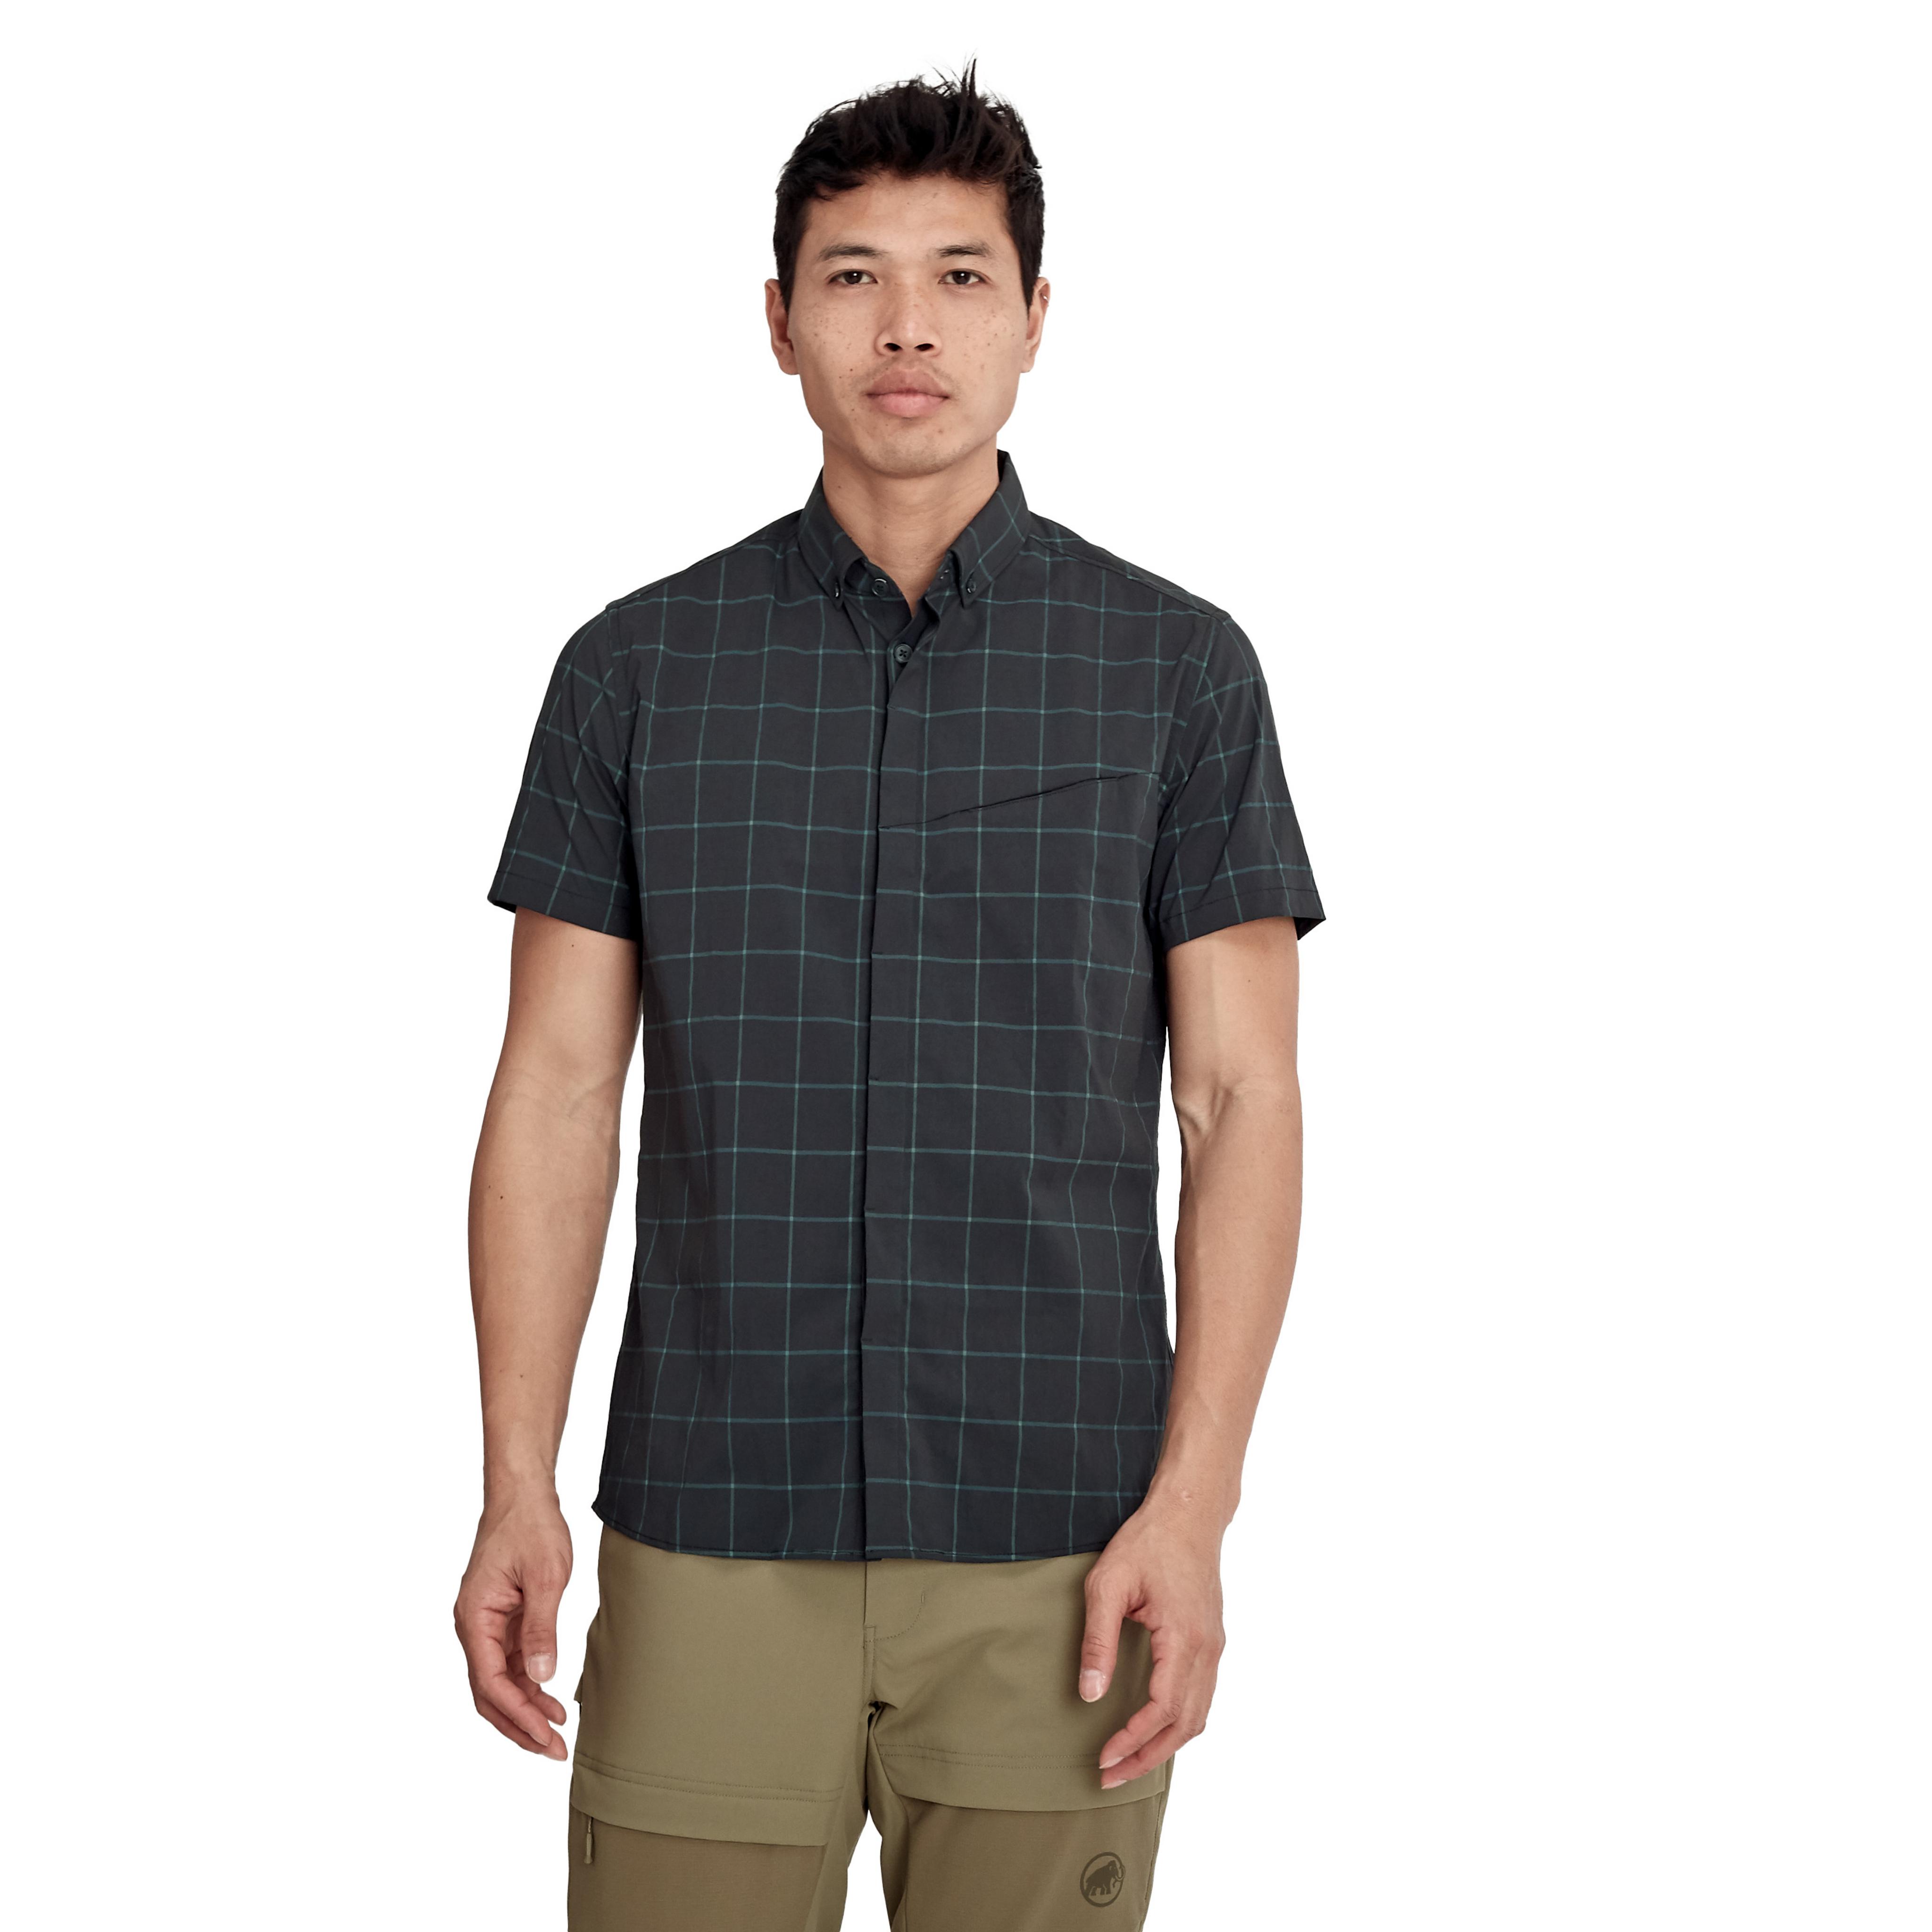 Mountain Shirt Men product image